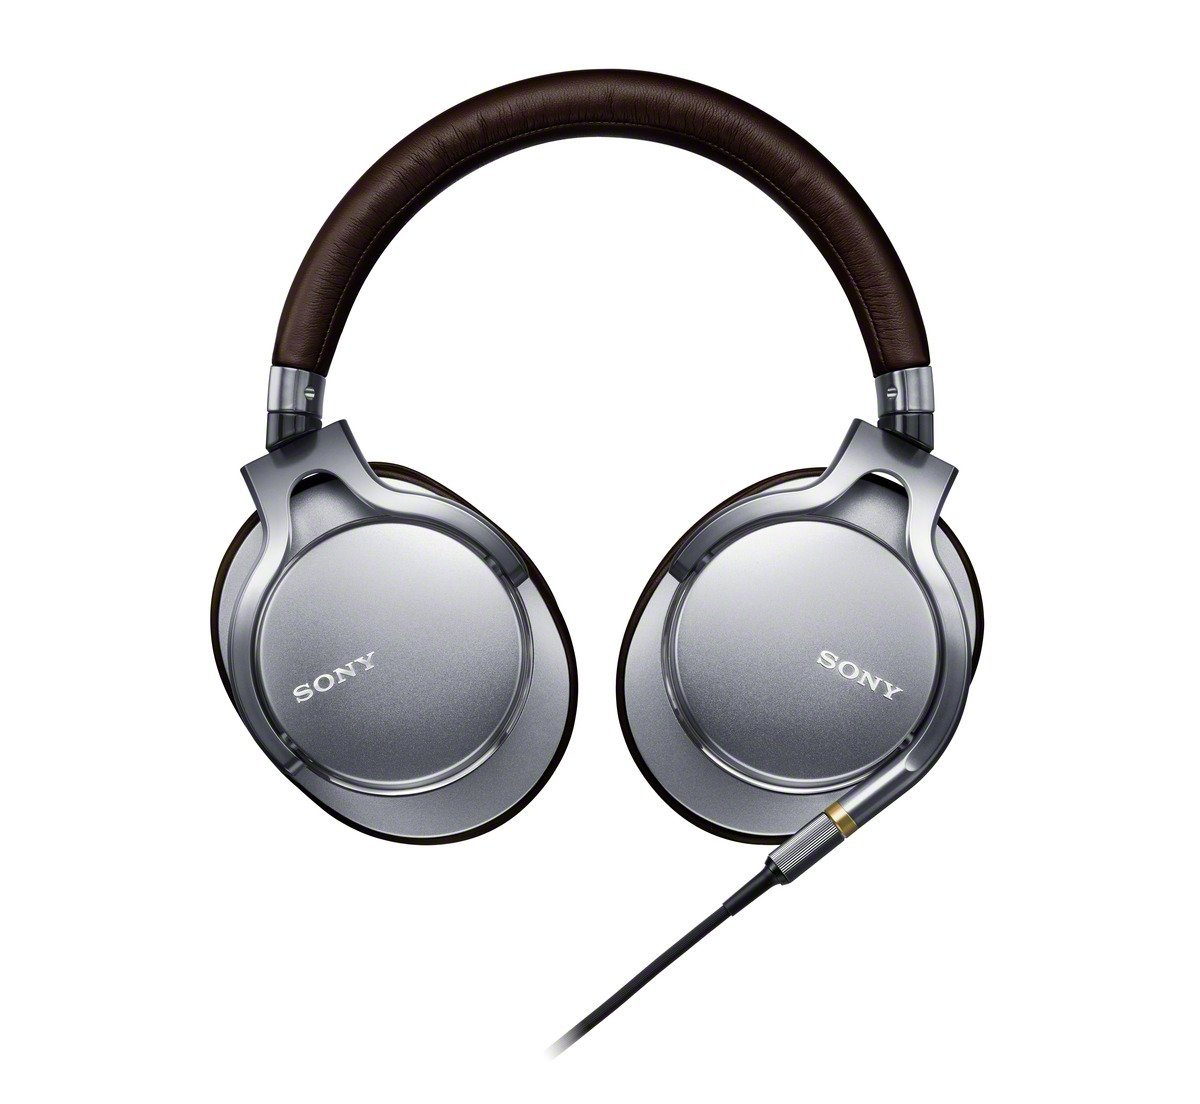 Sony Hi-Res MDR-1AS